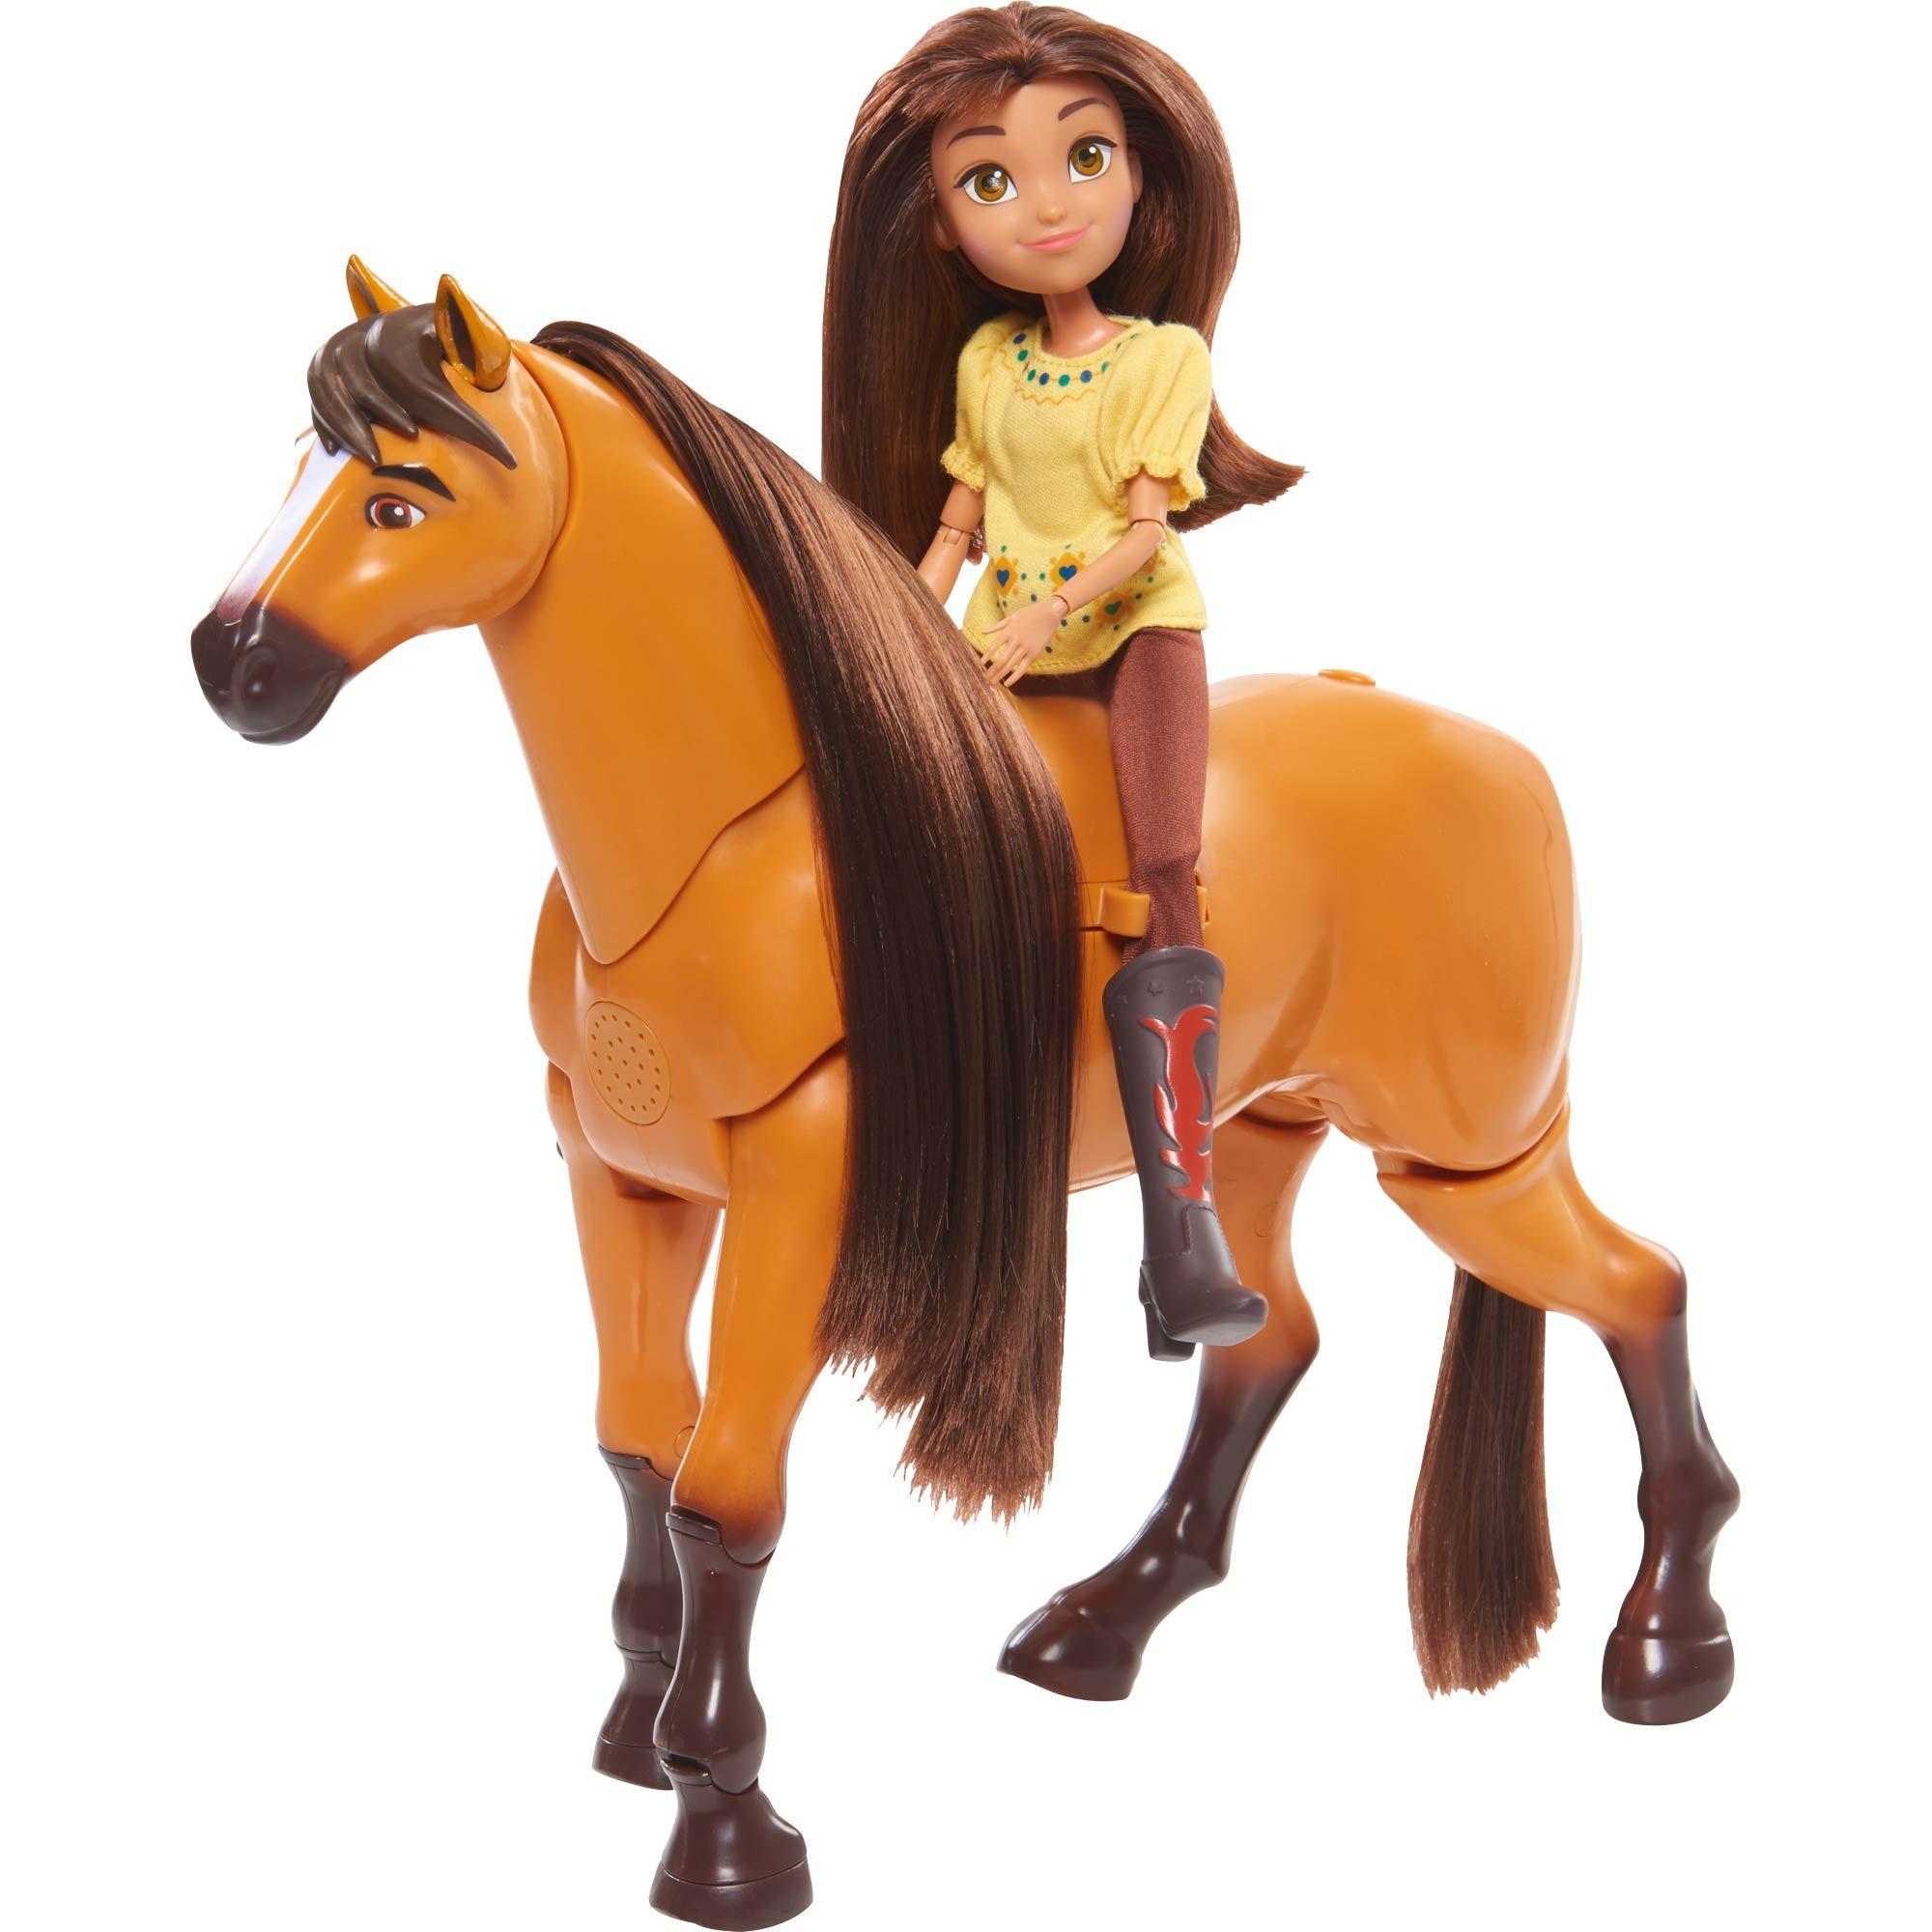 The Netflix original series, DreamWorks Spirit Riding Free